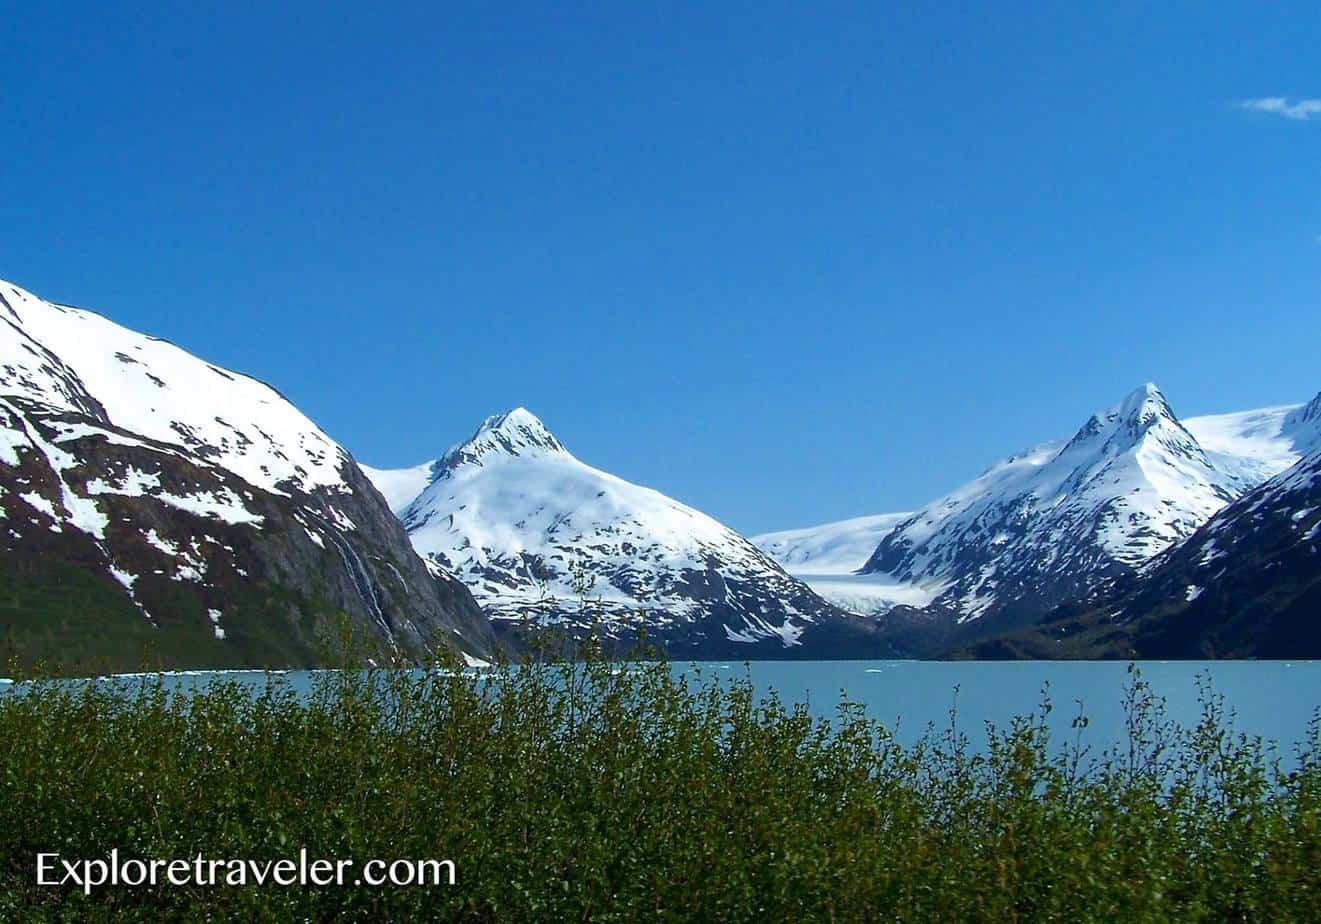 Alaska Marine Highway - Whittier Alaska Gateway to the glacier and wildlife filled Prince William Sound